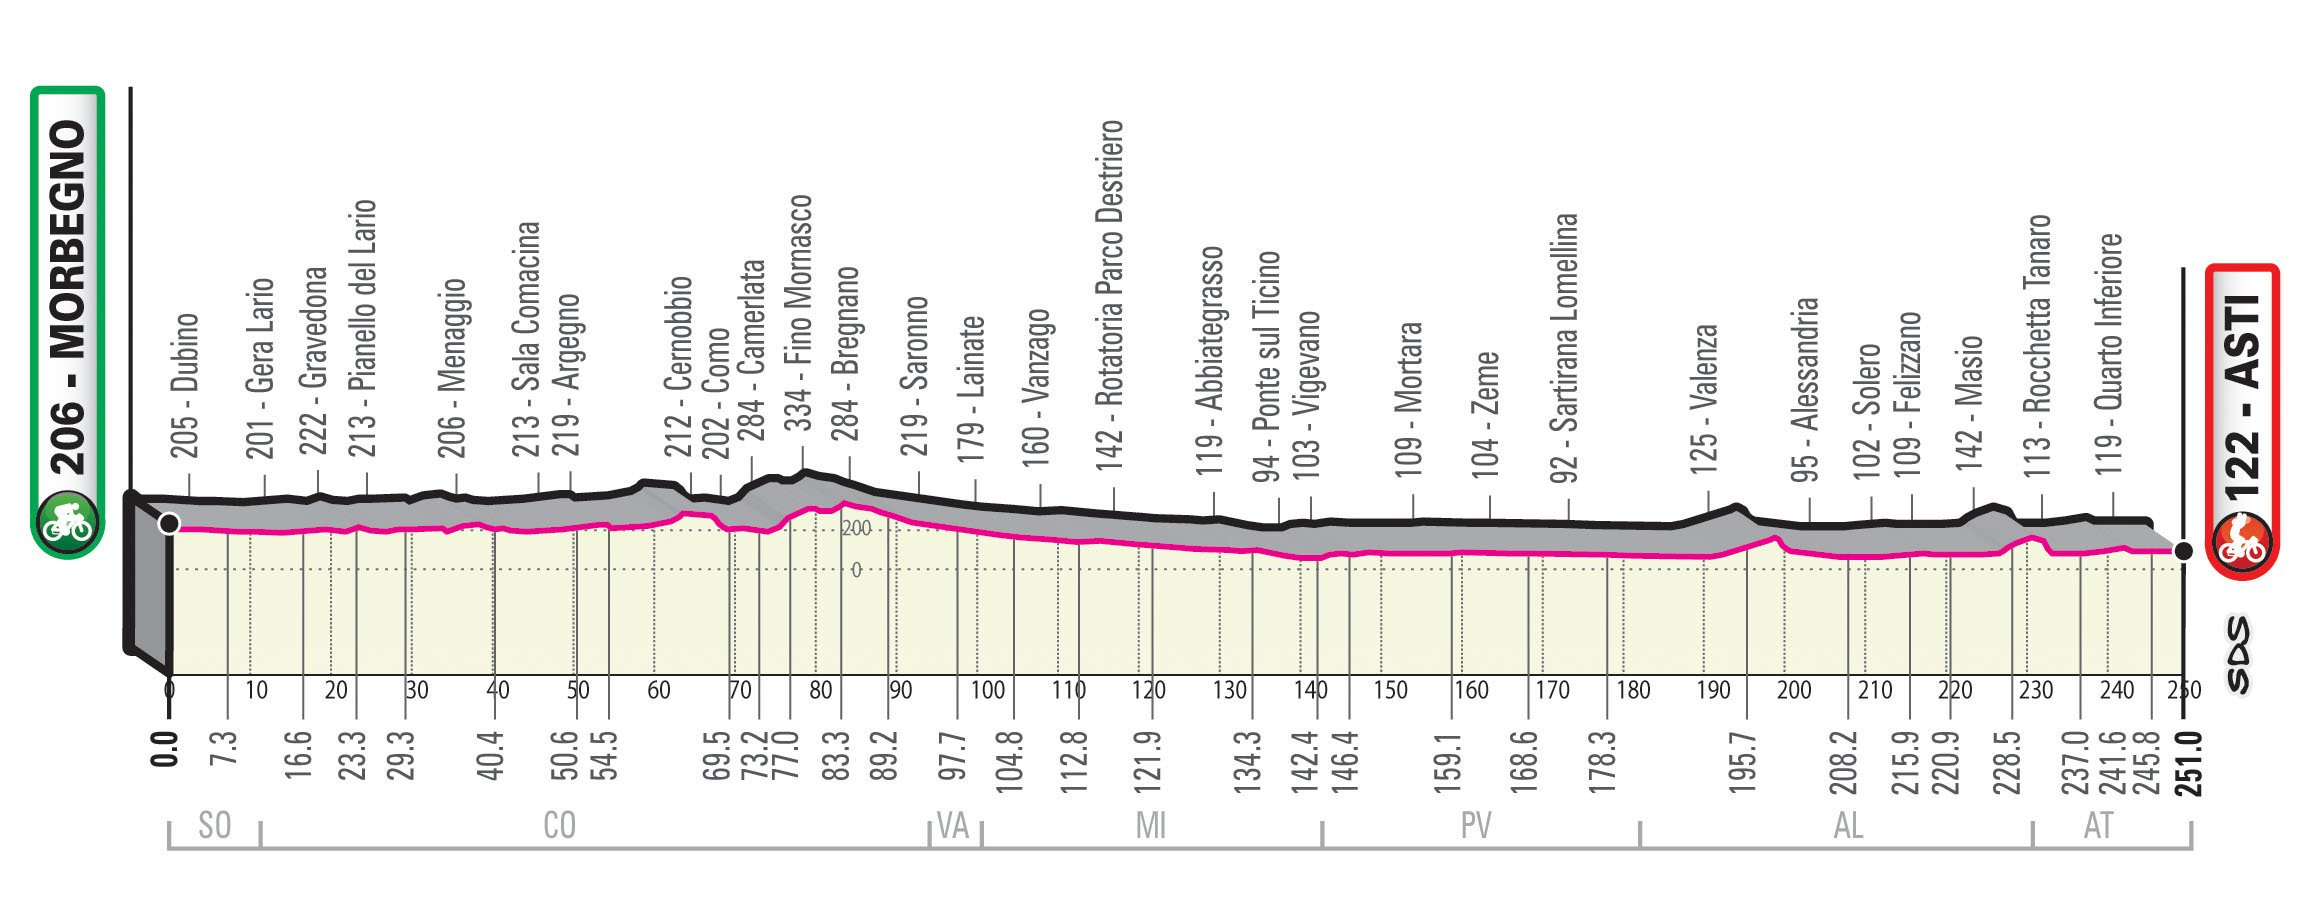 Morbegno – Asti. 251 kilómetros